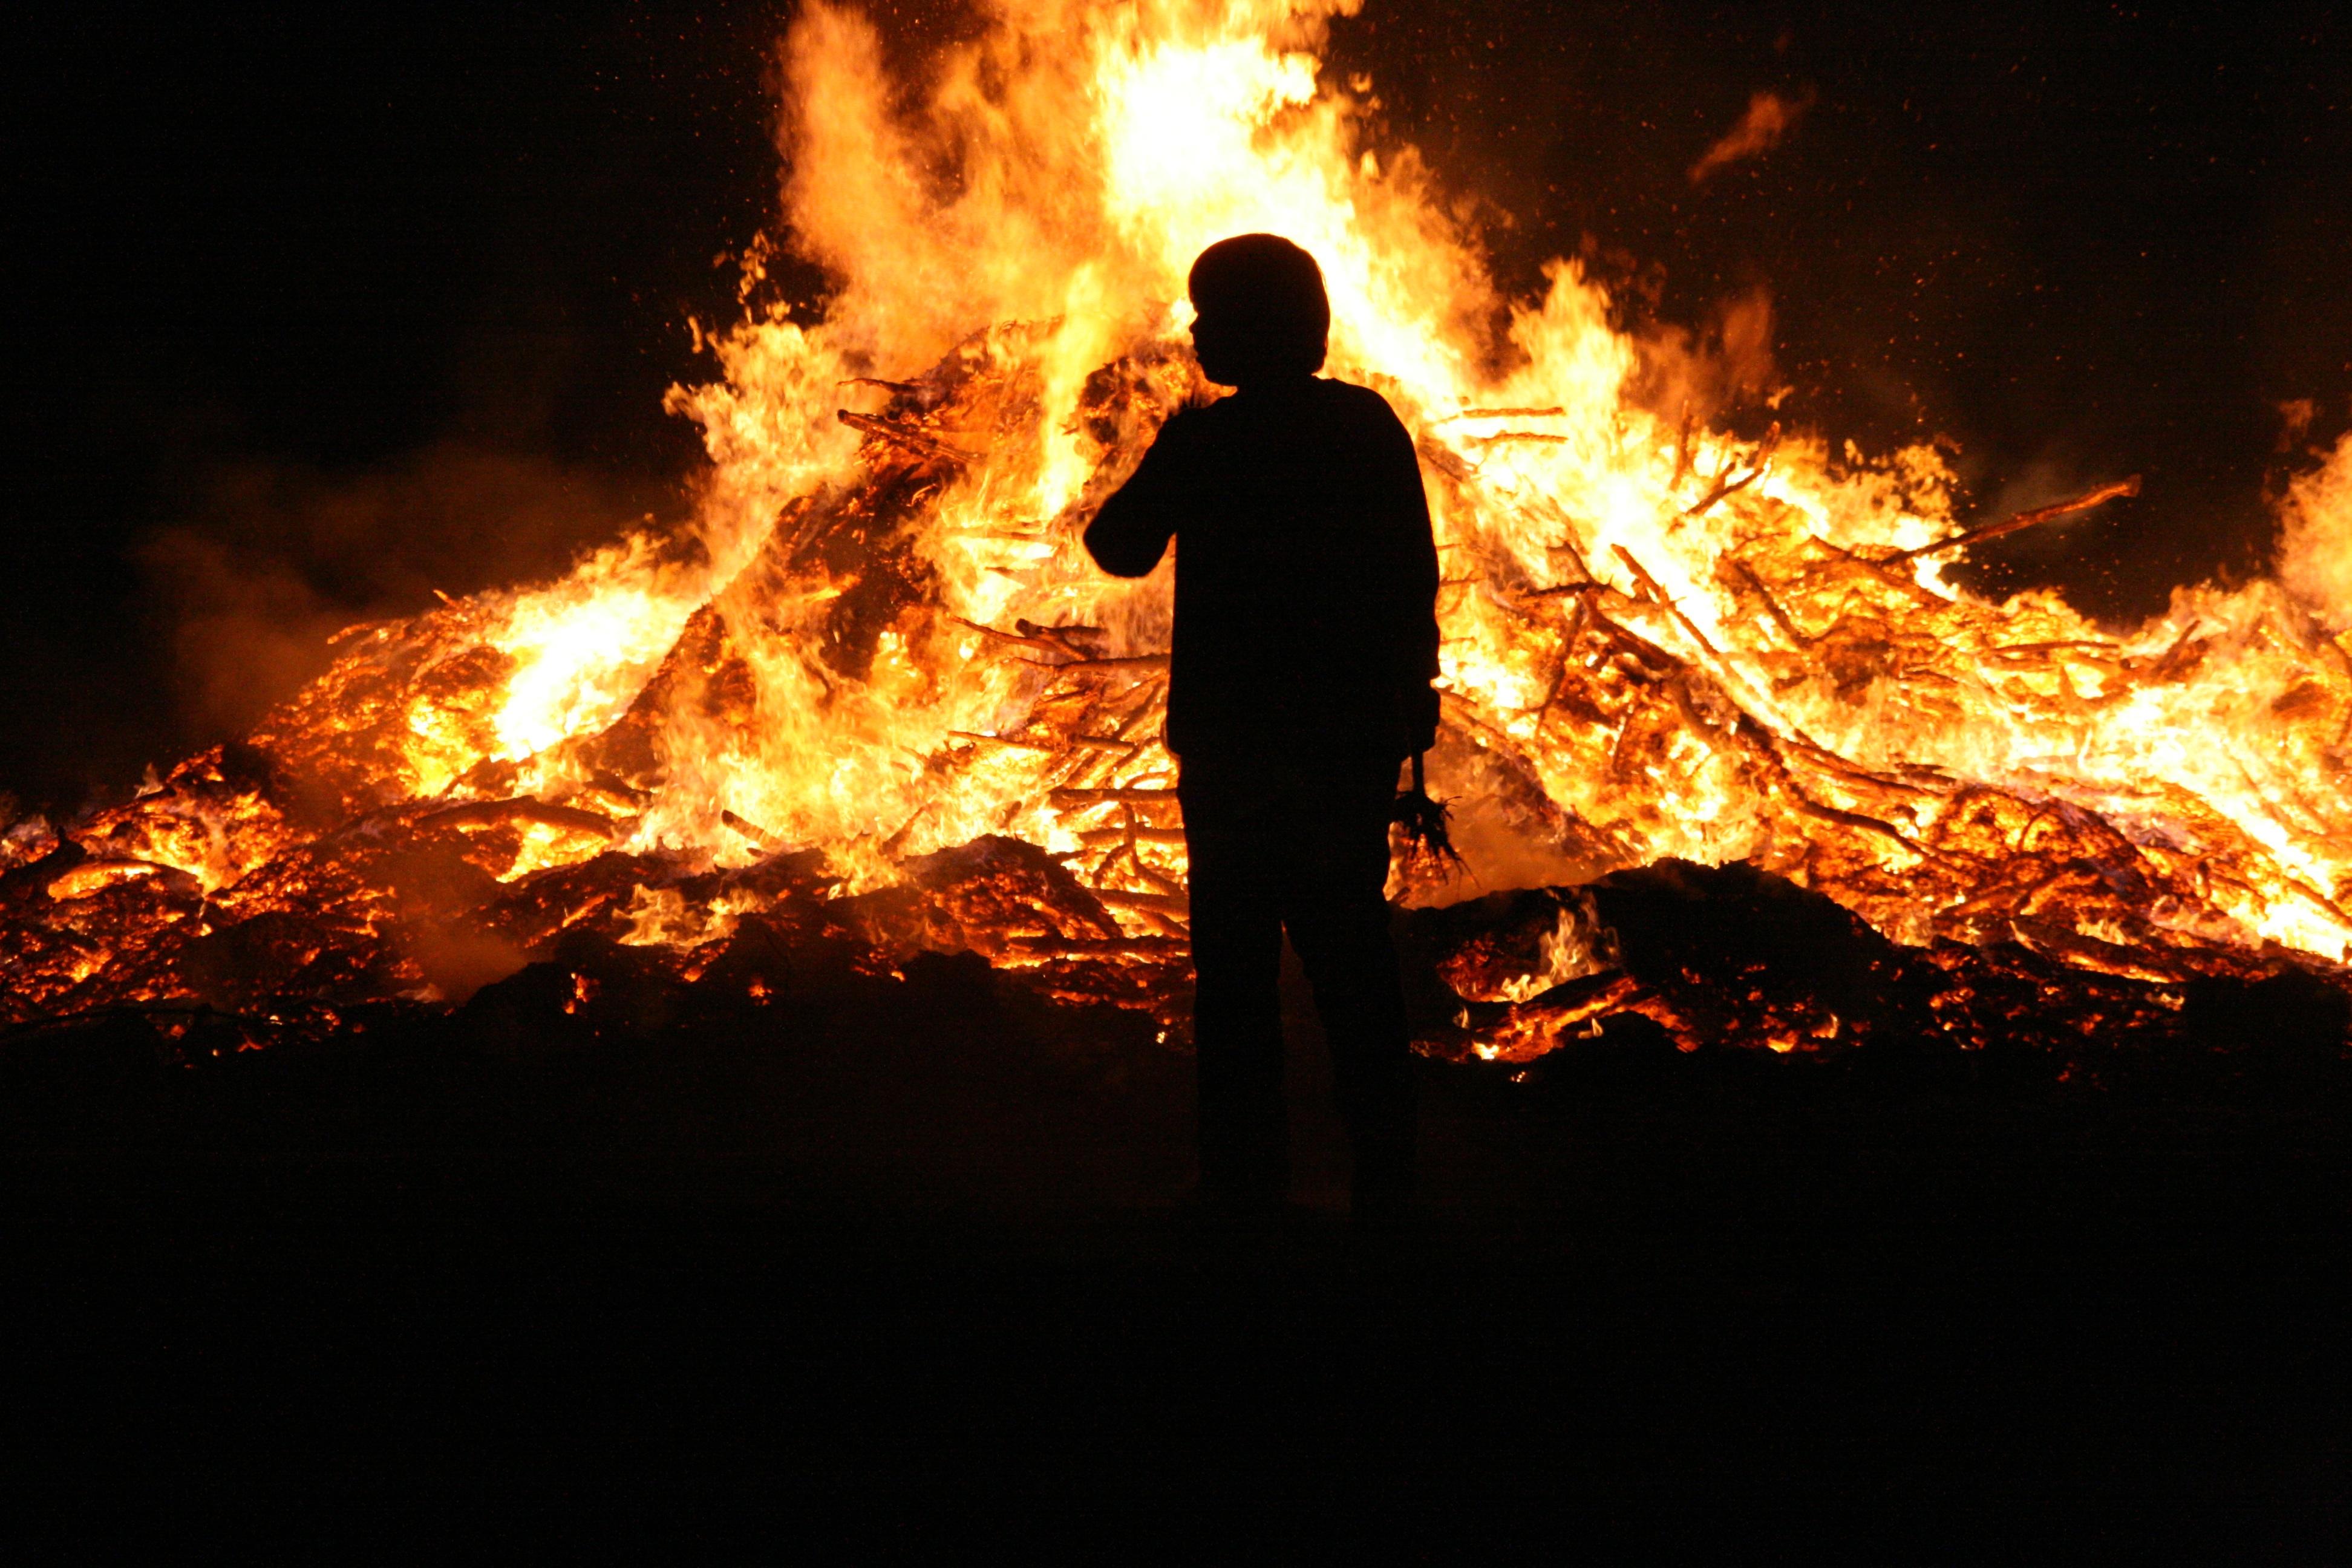 Free Images : flame, campfire, bonfire, burn, blaze, wood fire, customs, easter fire 3888x2592